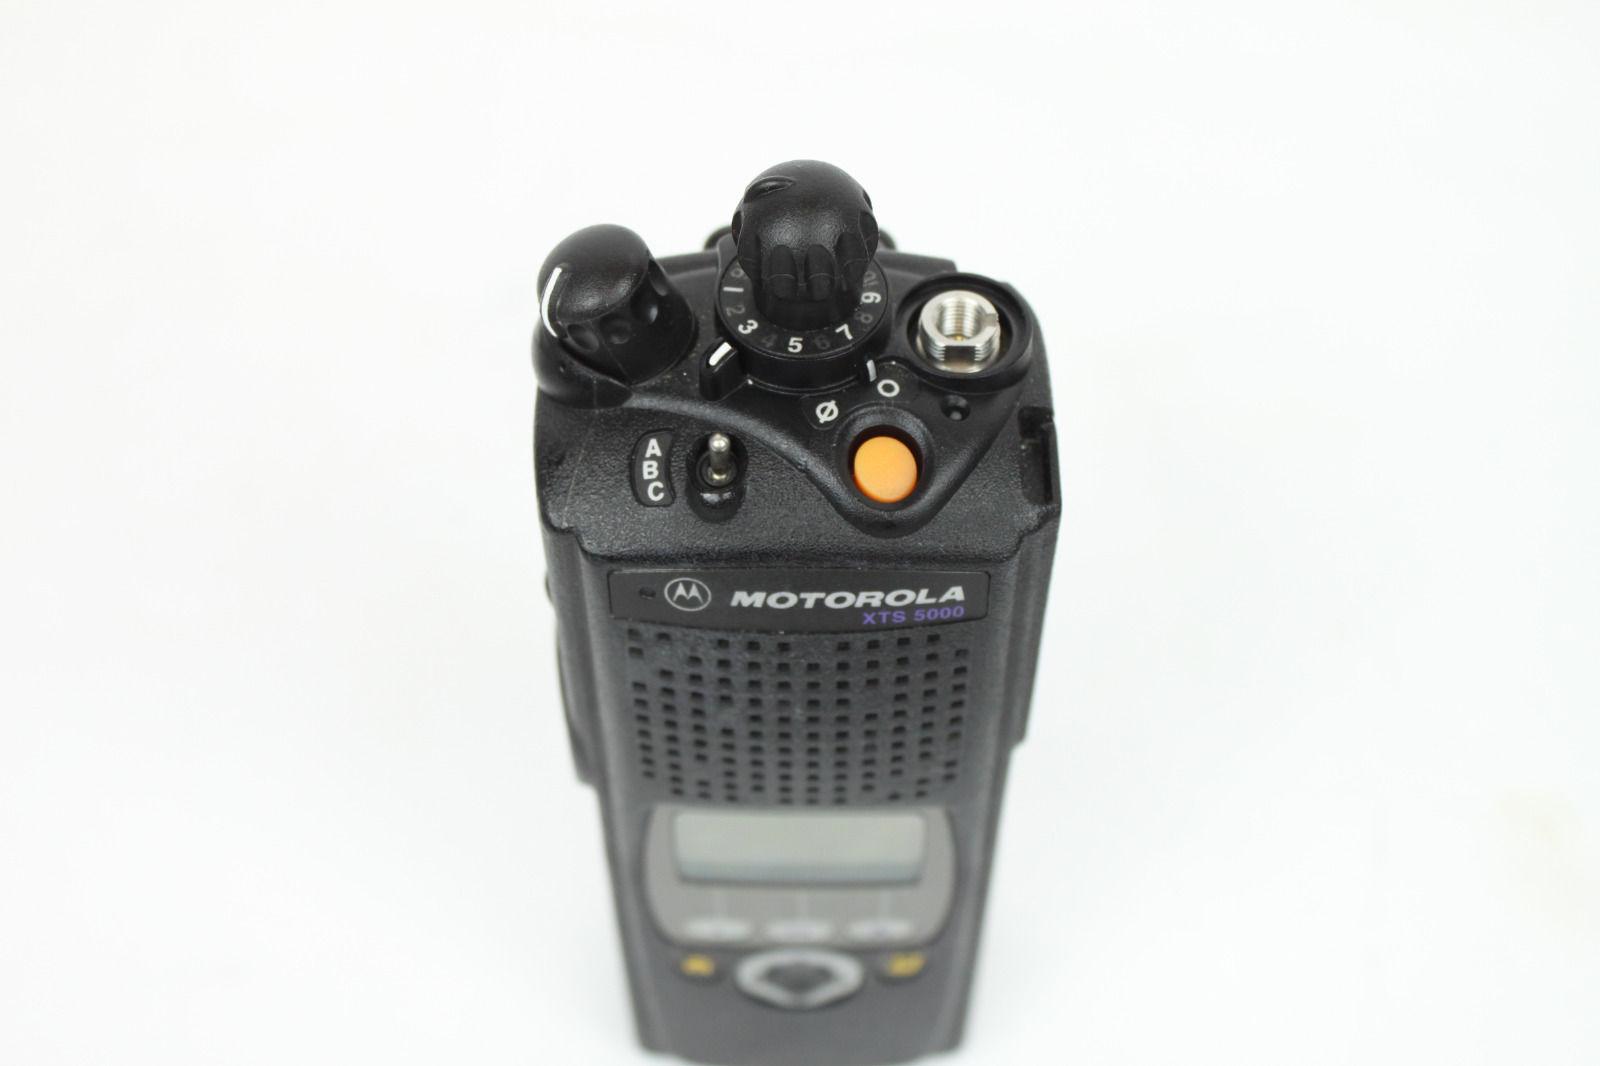 Radio holder motorola apx 6000 - Description